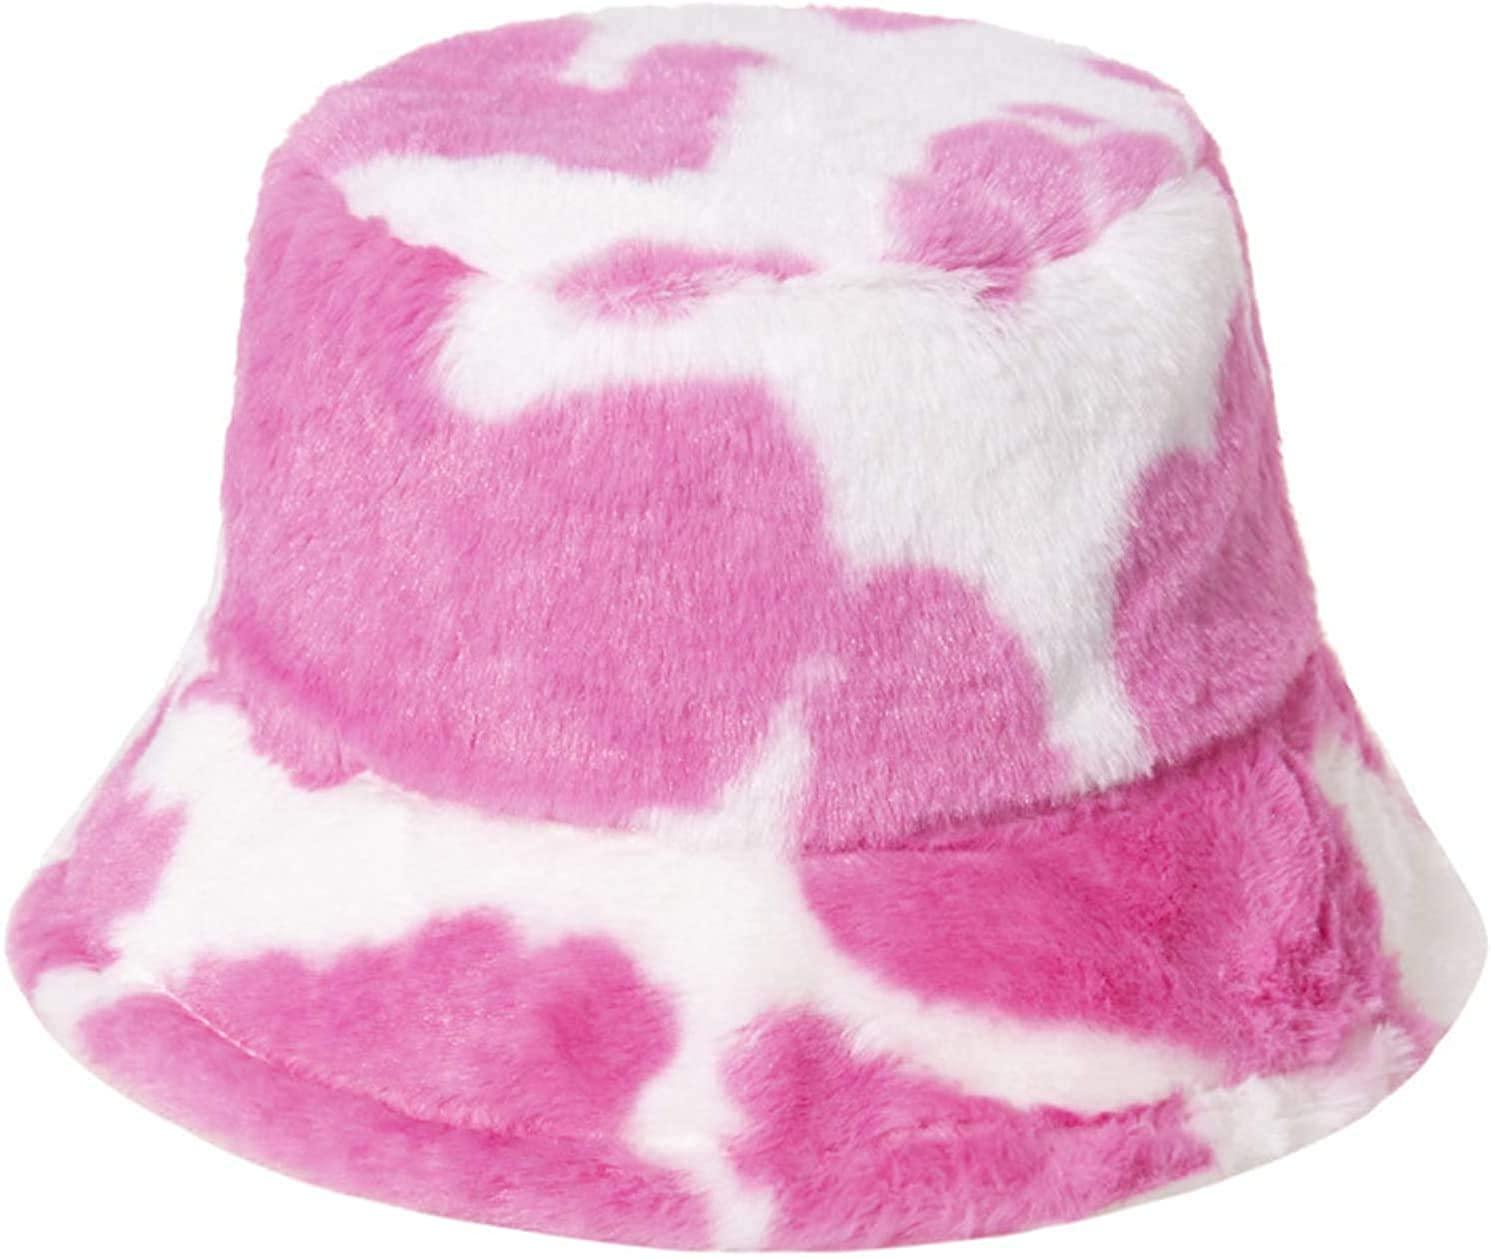 Yinitoo Winter Warm Fluffy Plush Bucket Hat Milk Cow Print Panama Fisherman Cap for Women Men